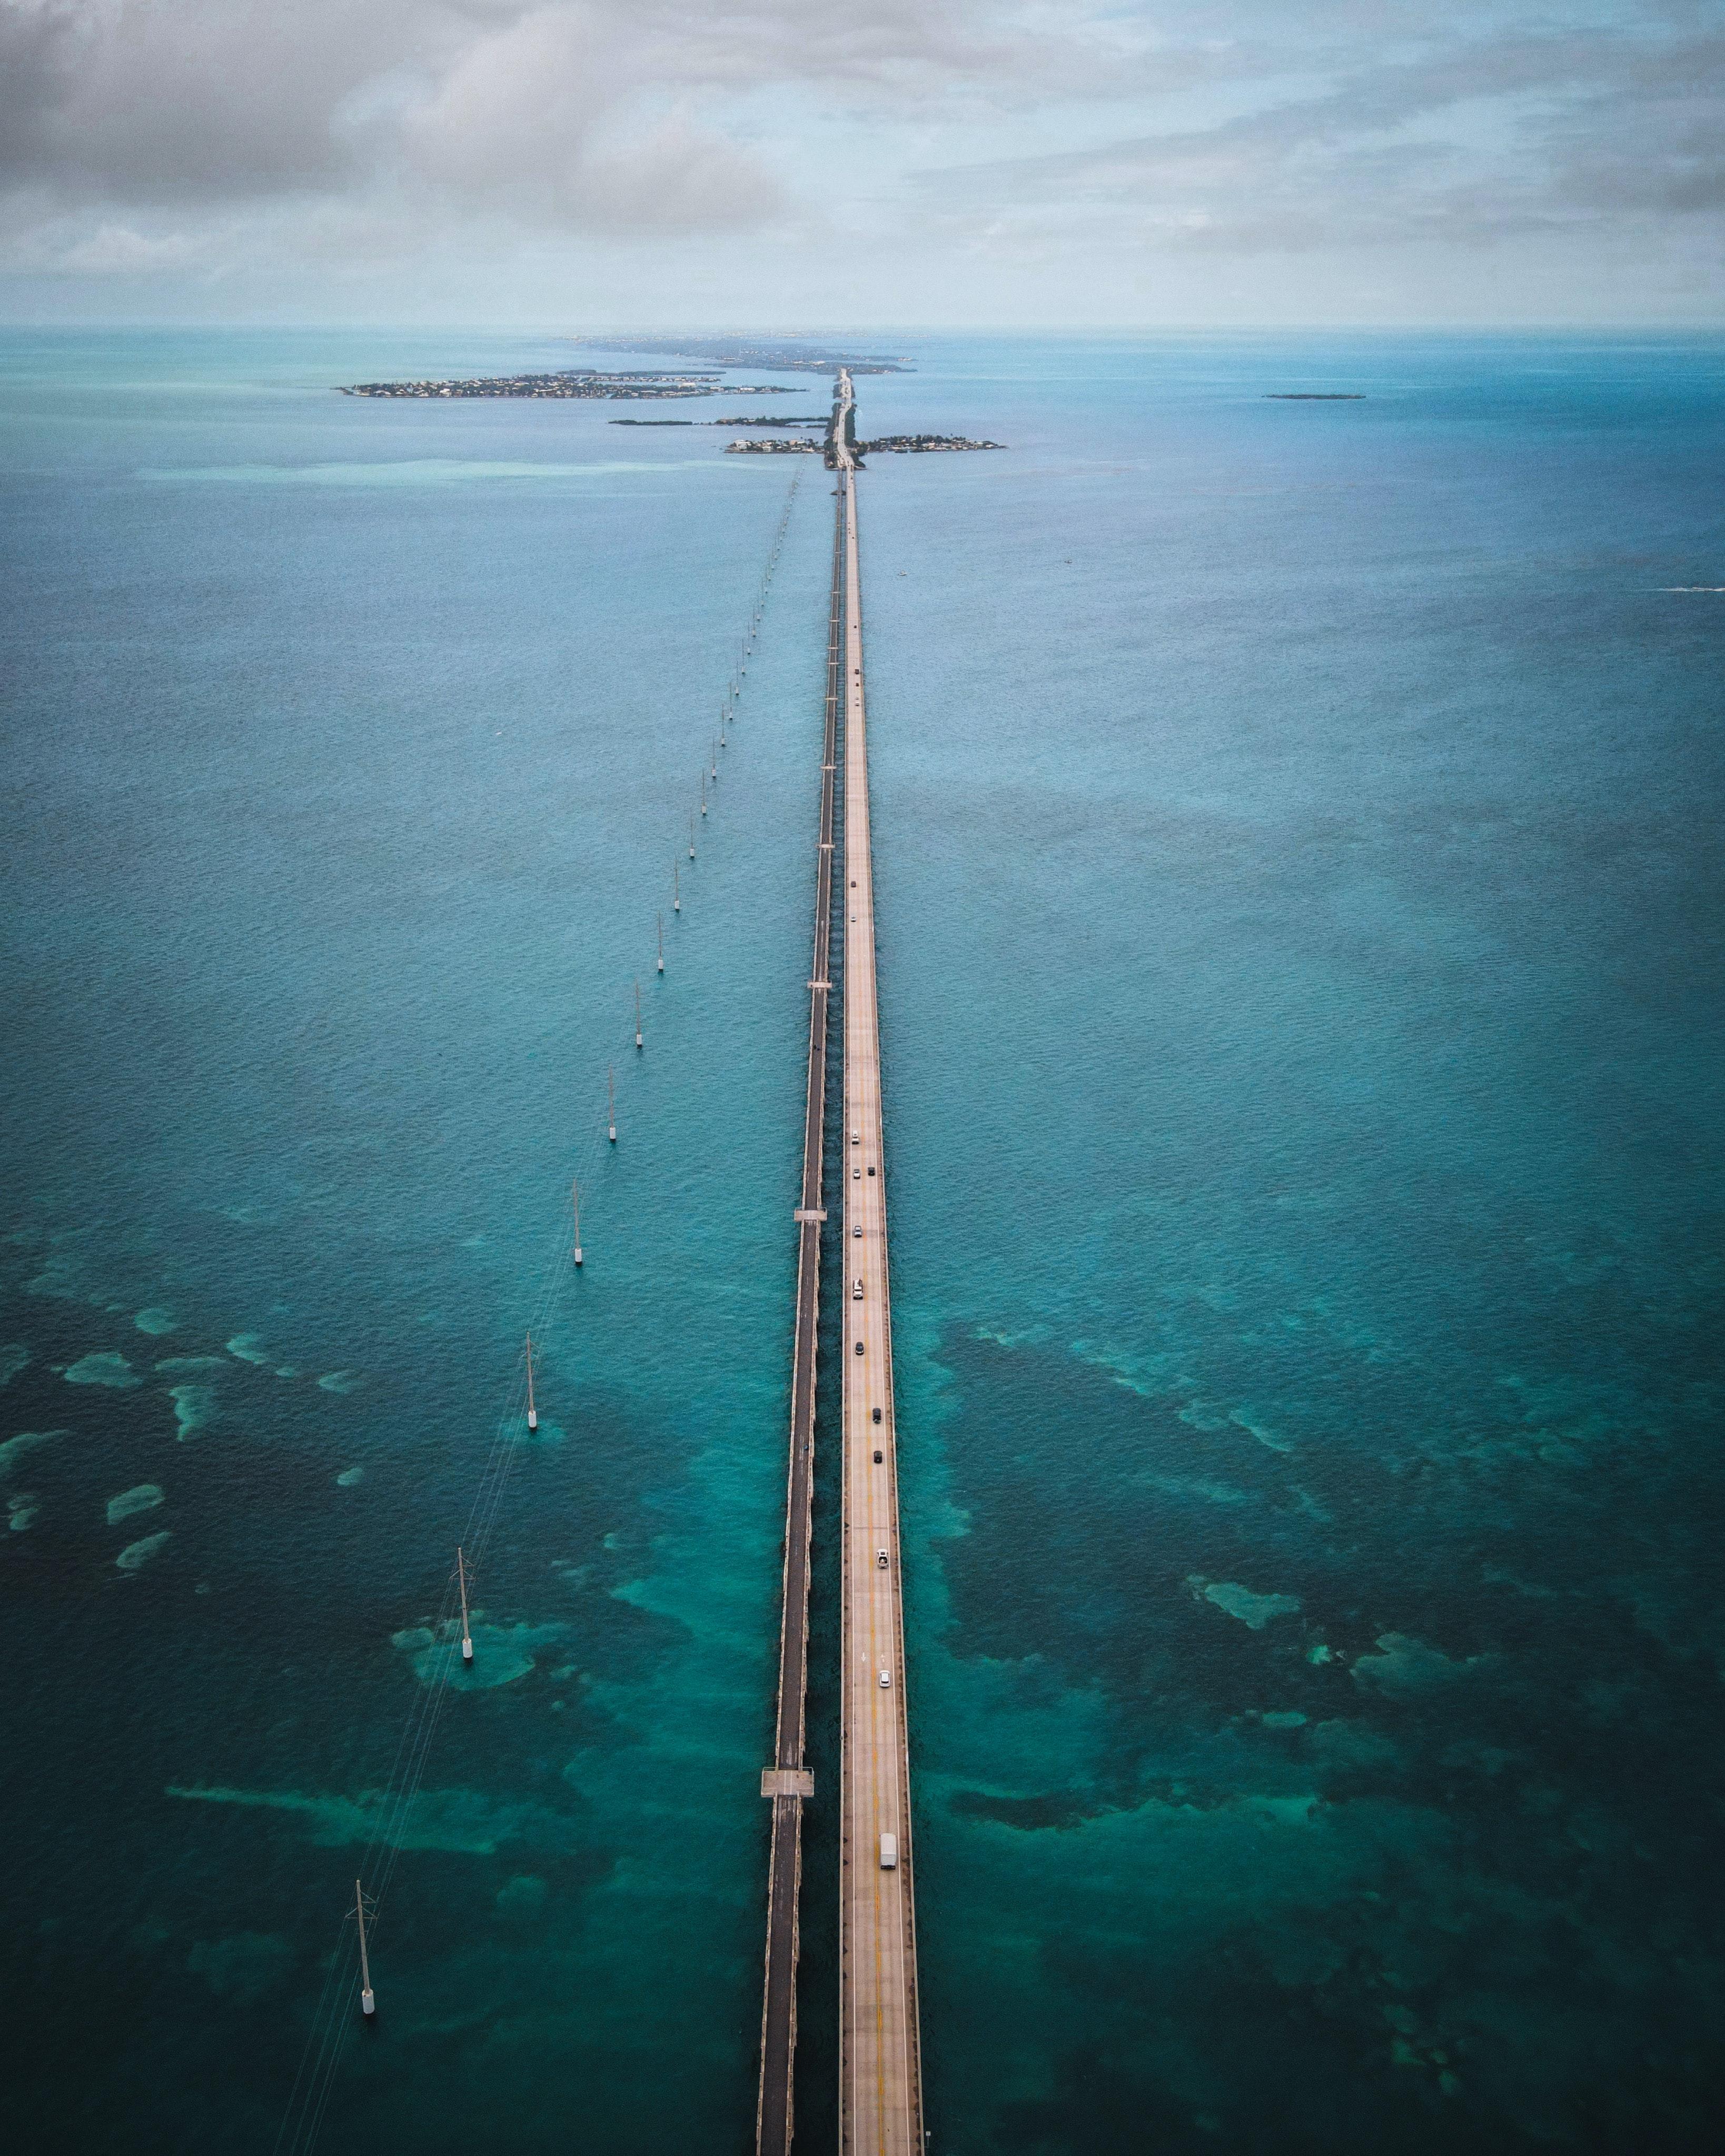 A bridge stretches across a vast expanse of dark turquoise ocean.